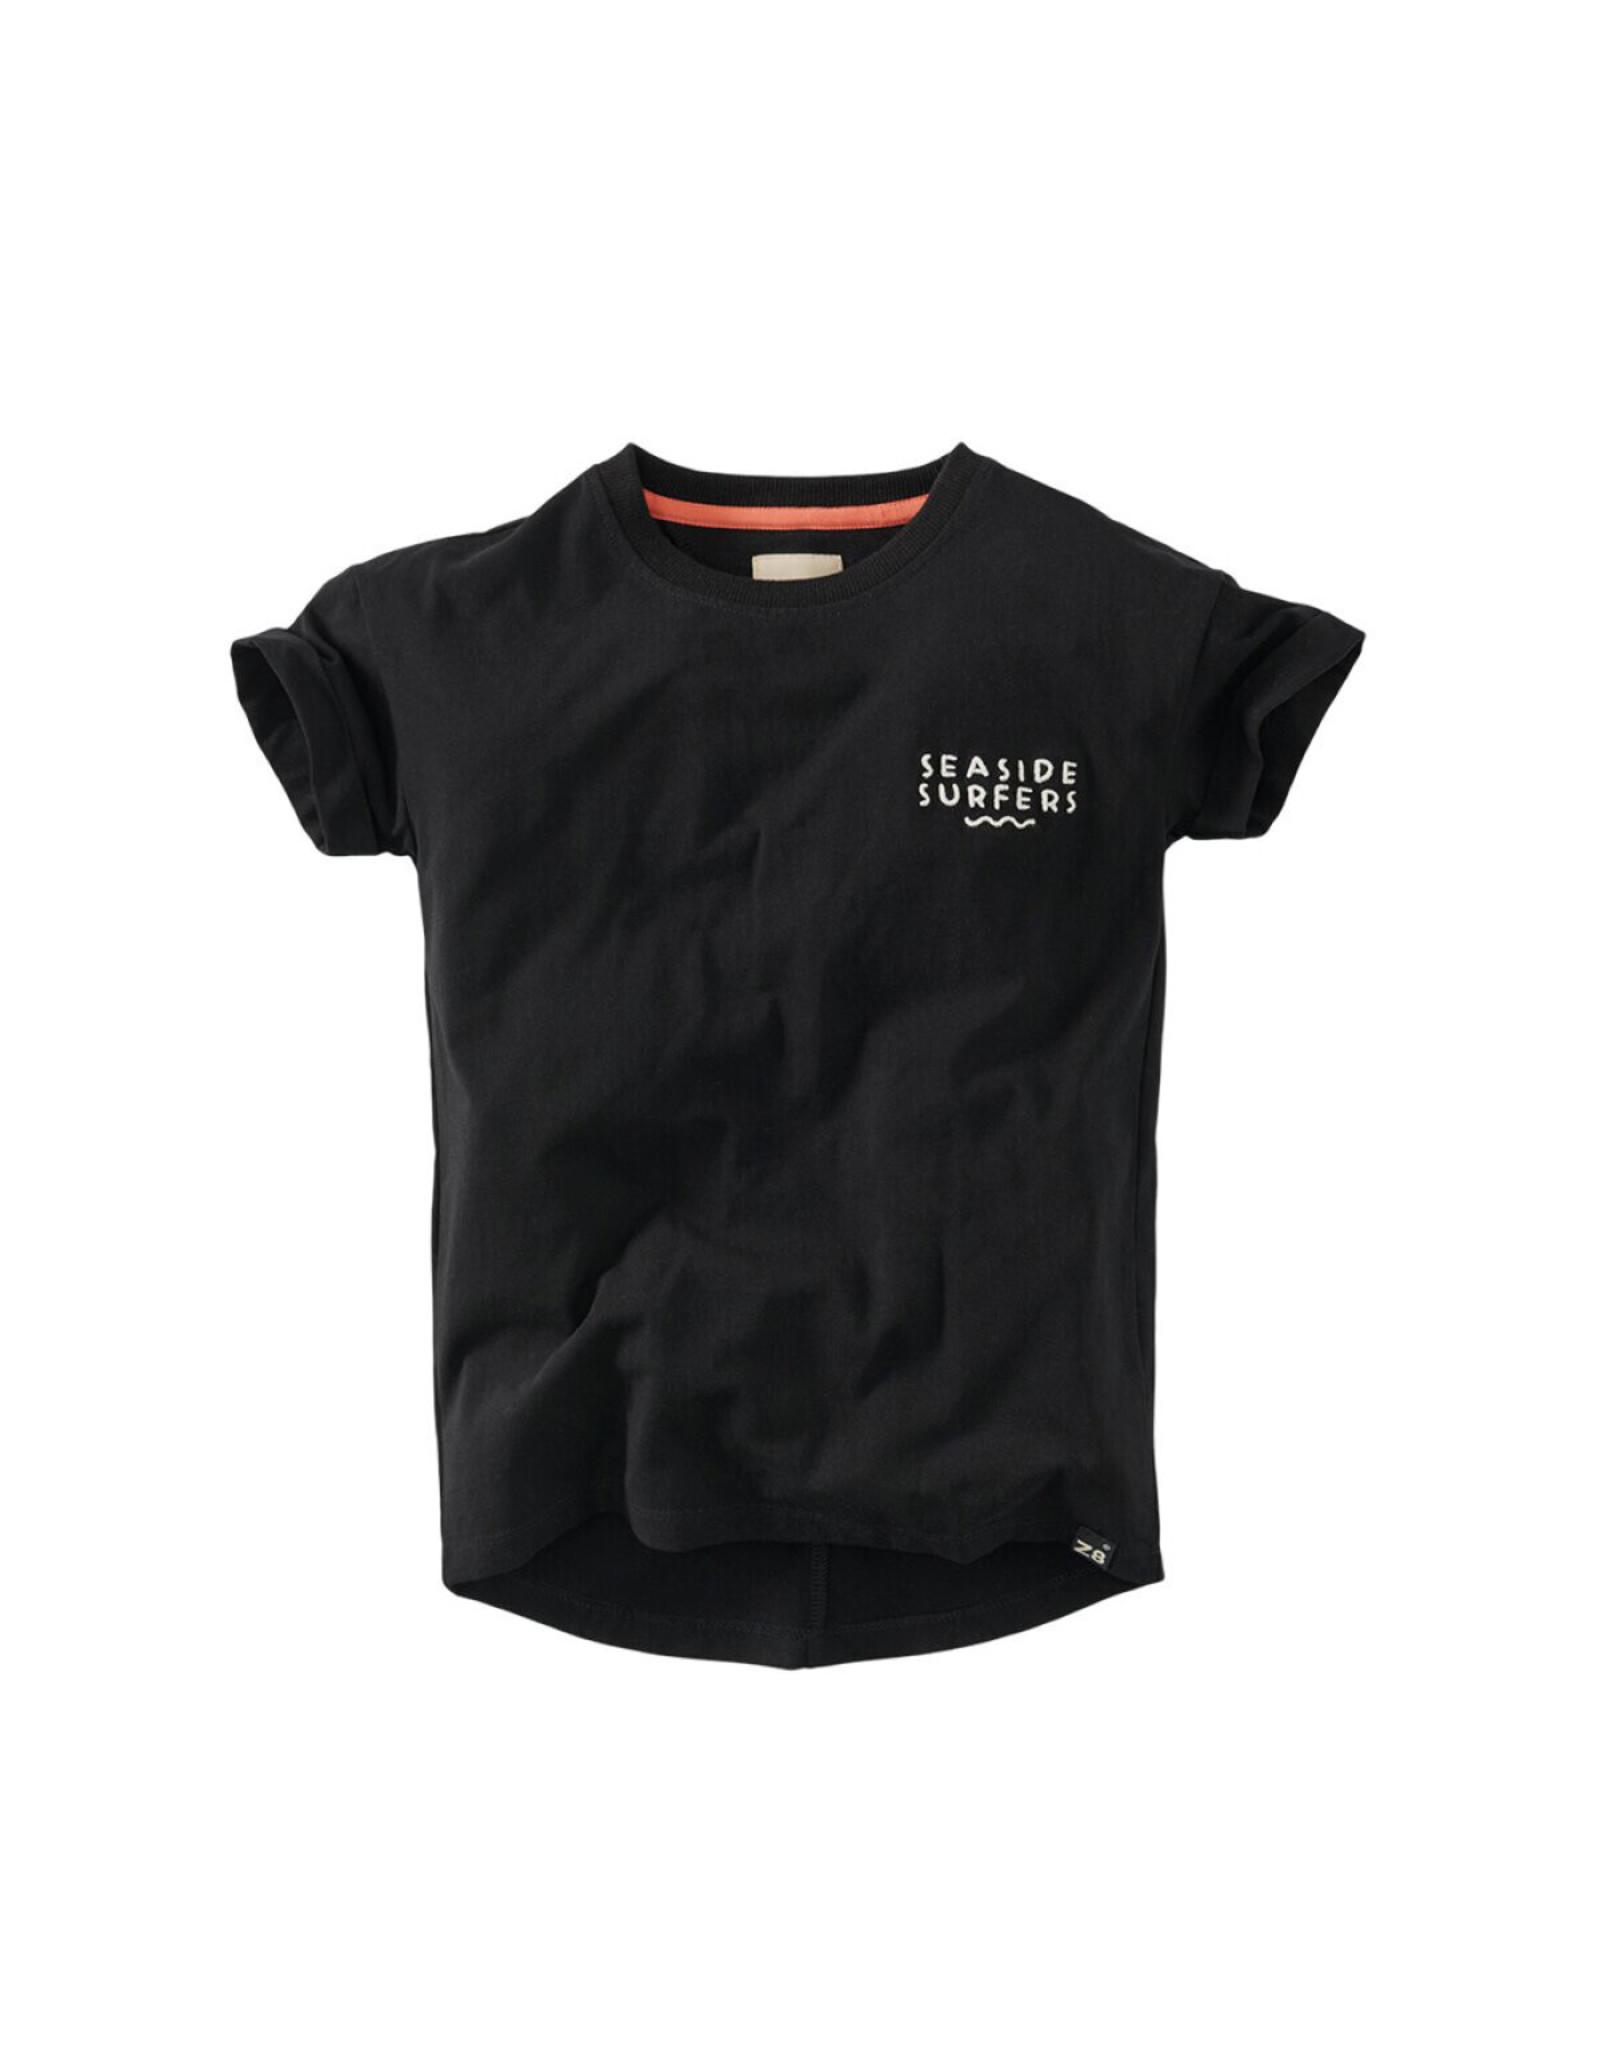 Z8 Daaf T-shirt